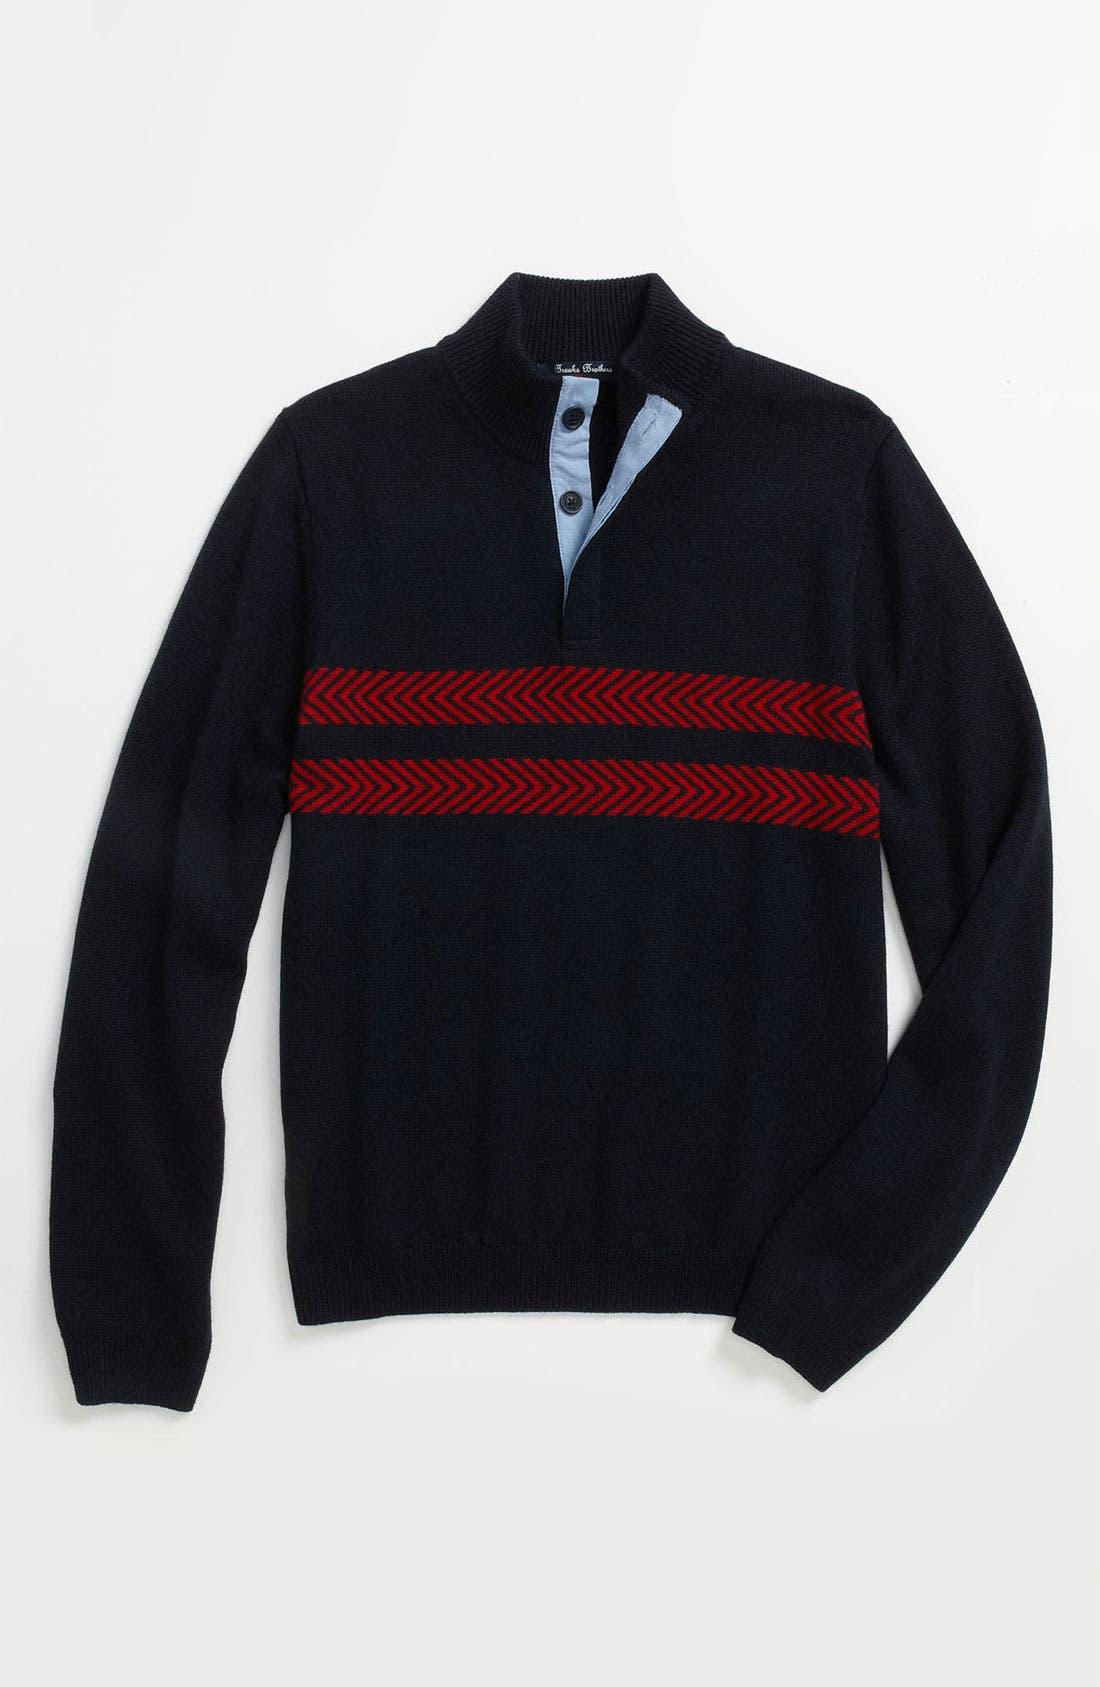 Main Image - Brooks Brothers Stand-Up Collar Sweater (Big Boys)